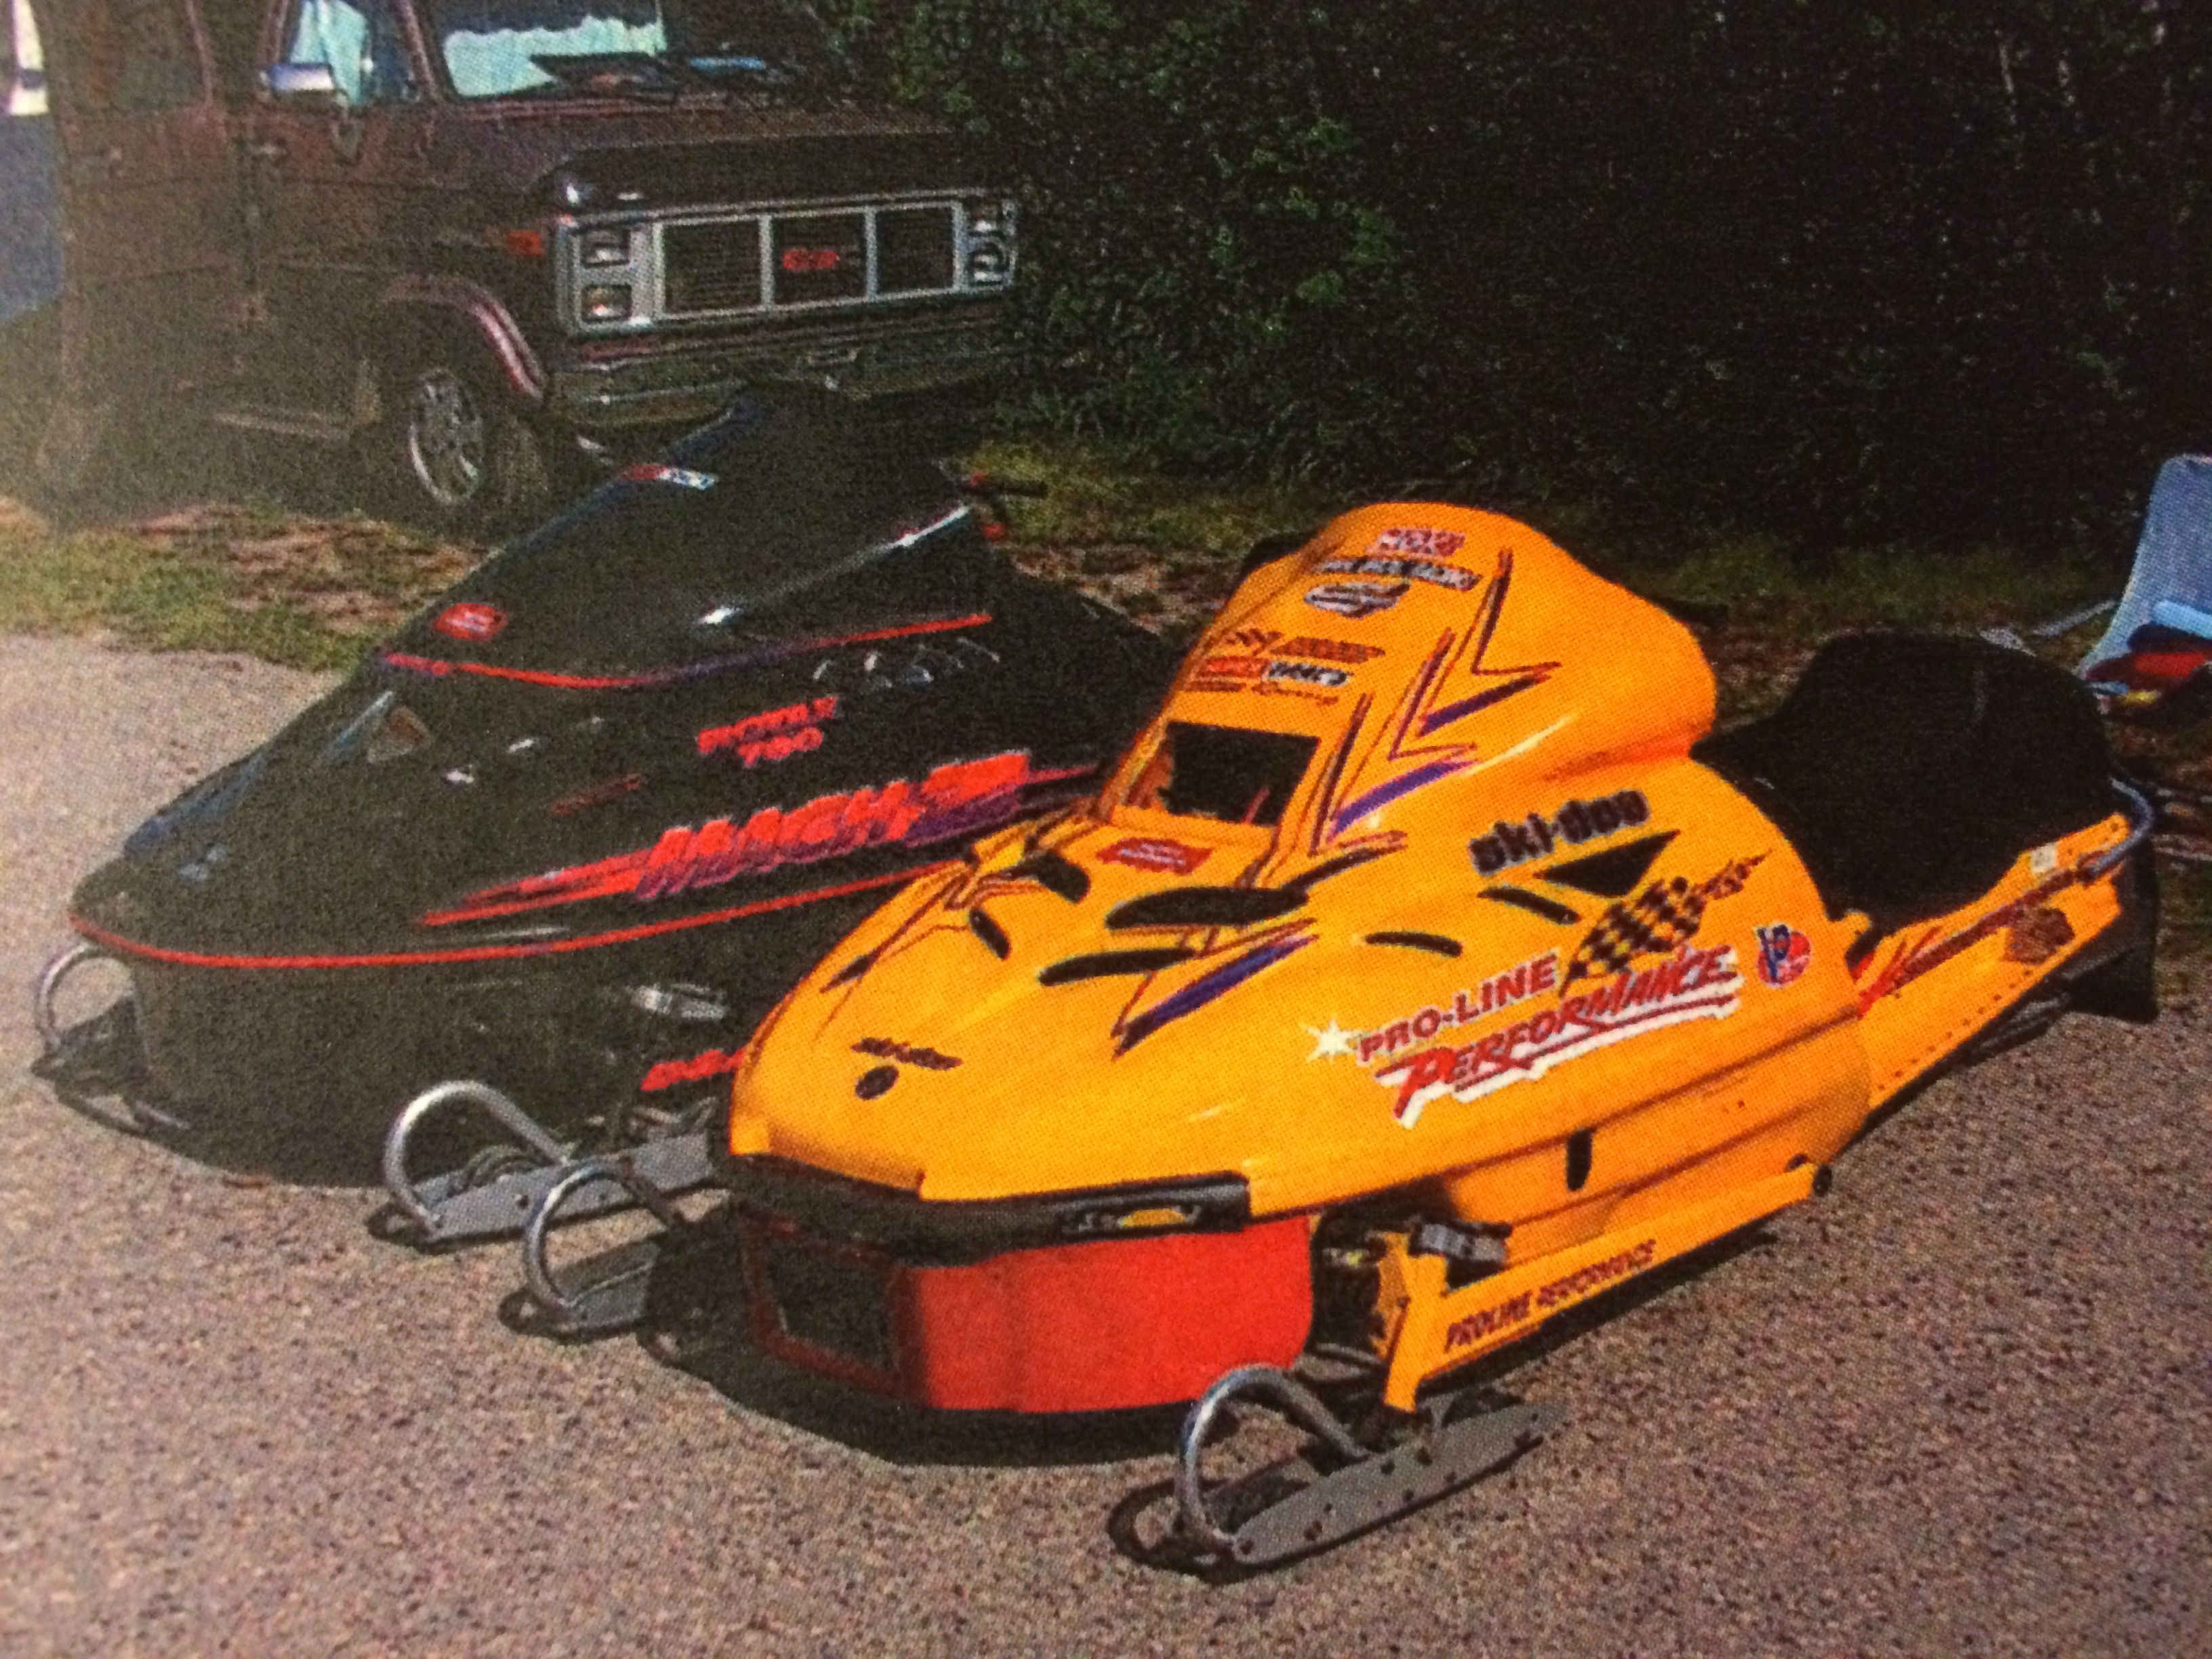 1989 Ski Doo Mxz 670 With A 780 Split Second Stoked Engine Vintage Sled Snowmobile Skiing